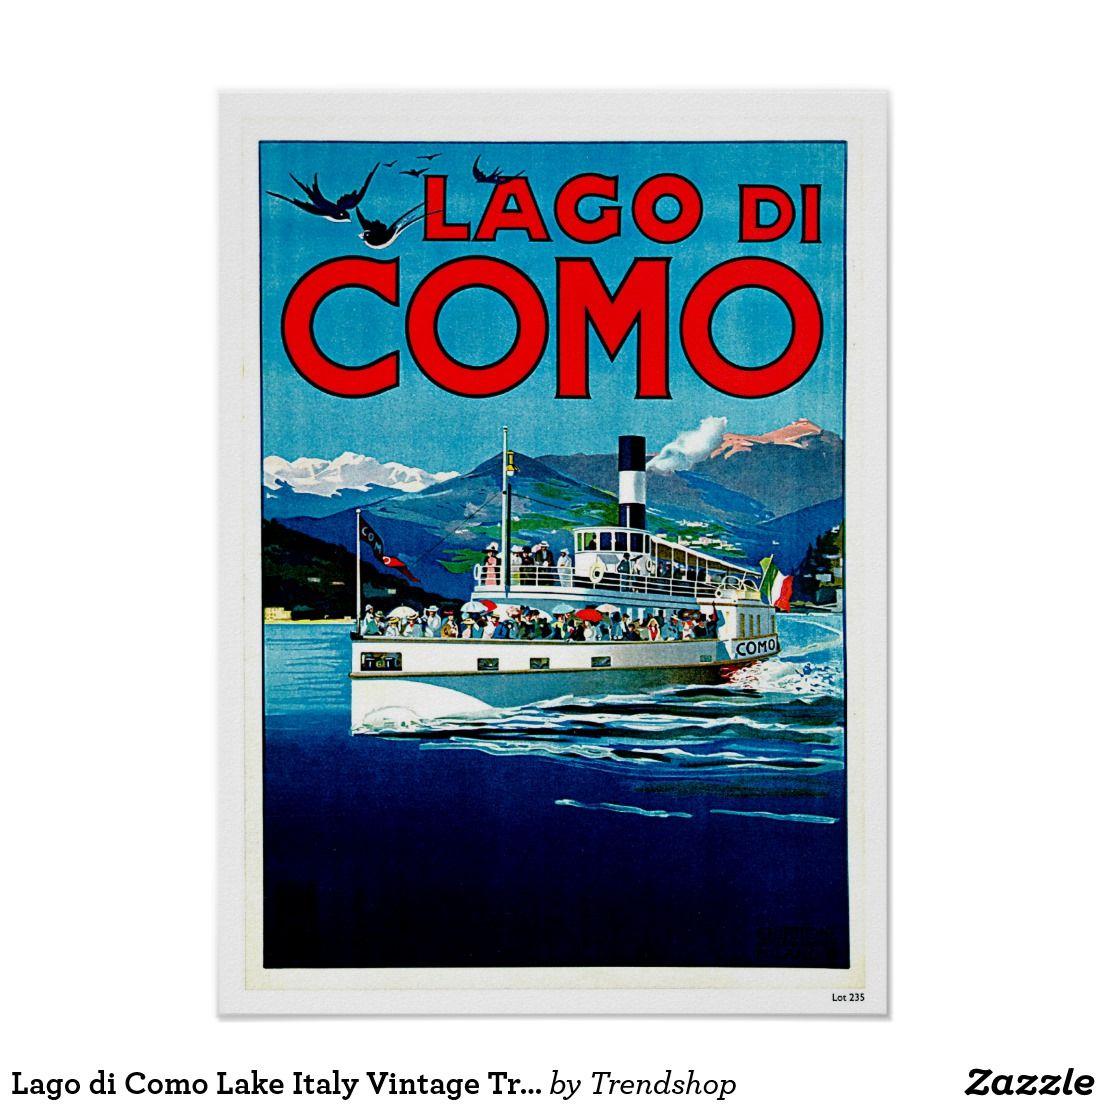 c158ee7fa2c Lago di Como Lake Italy Vintage Travel Poster  LakeComo  Travel  Posters